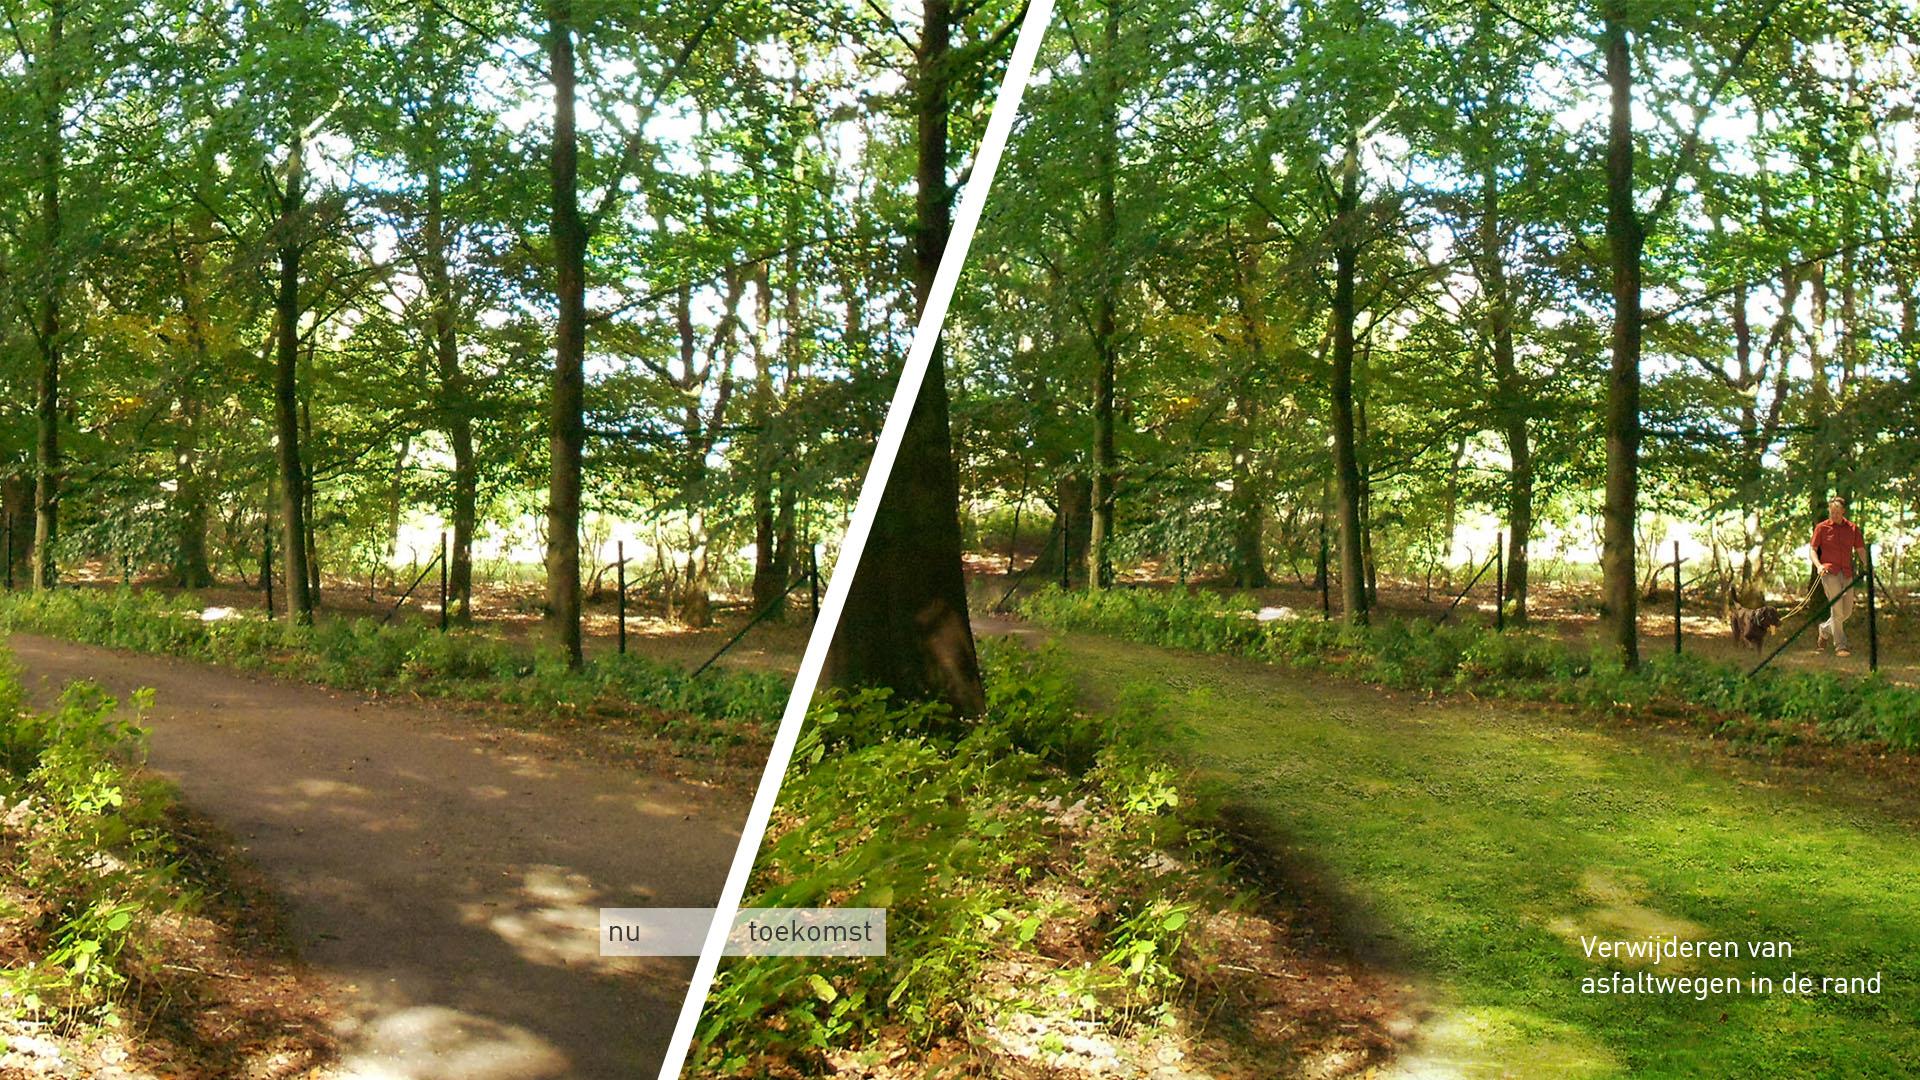 Serenity in the Randstad